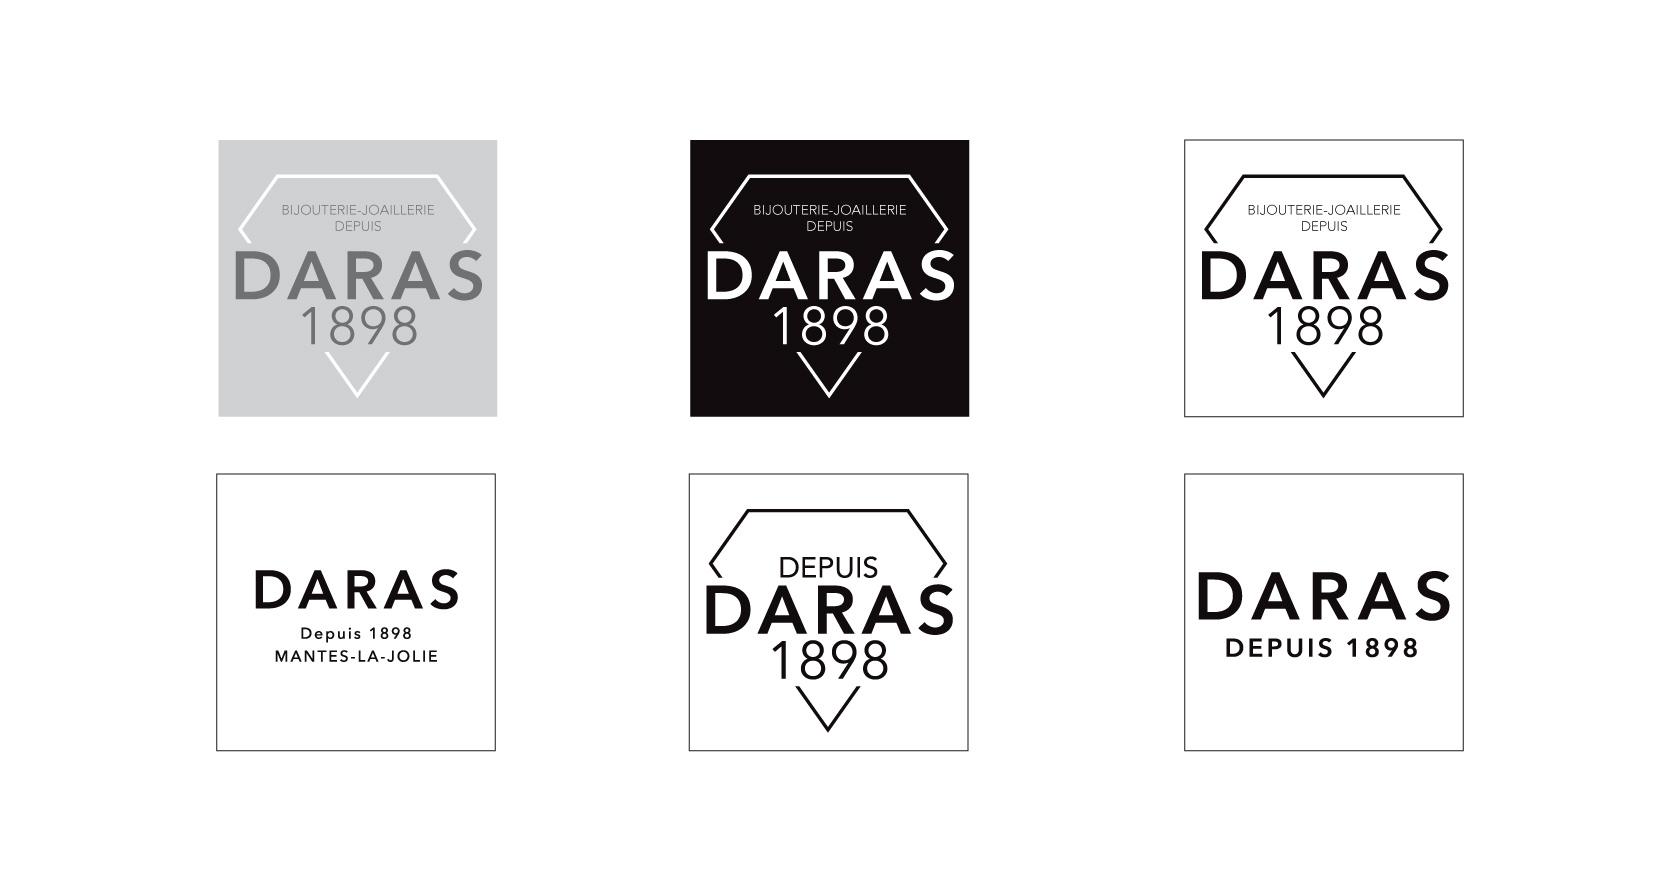 Identité Visuelle de DARAS - bijouterie-joaillerie - logotype